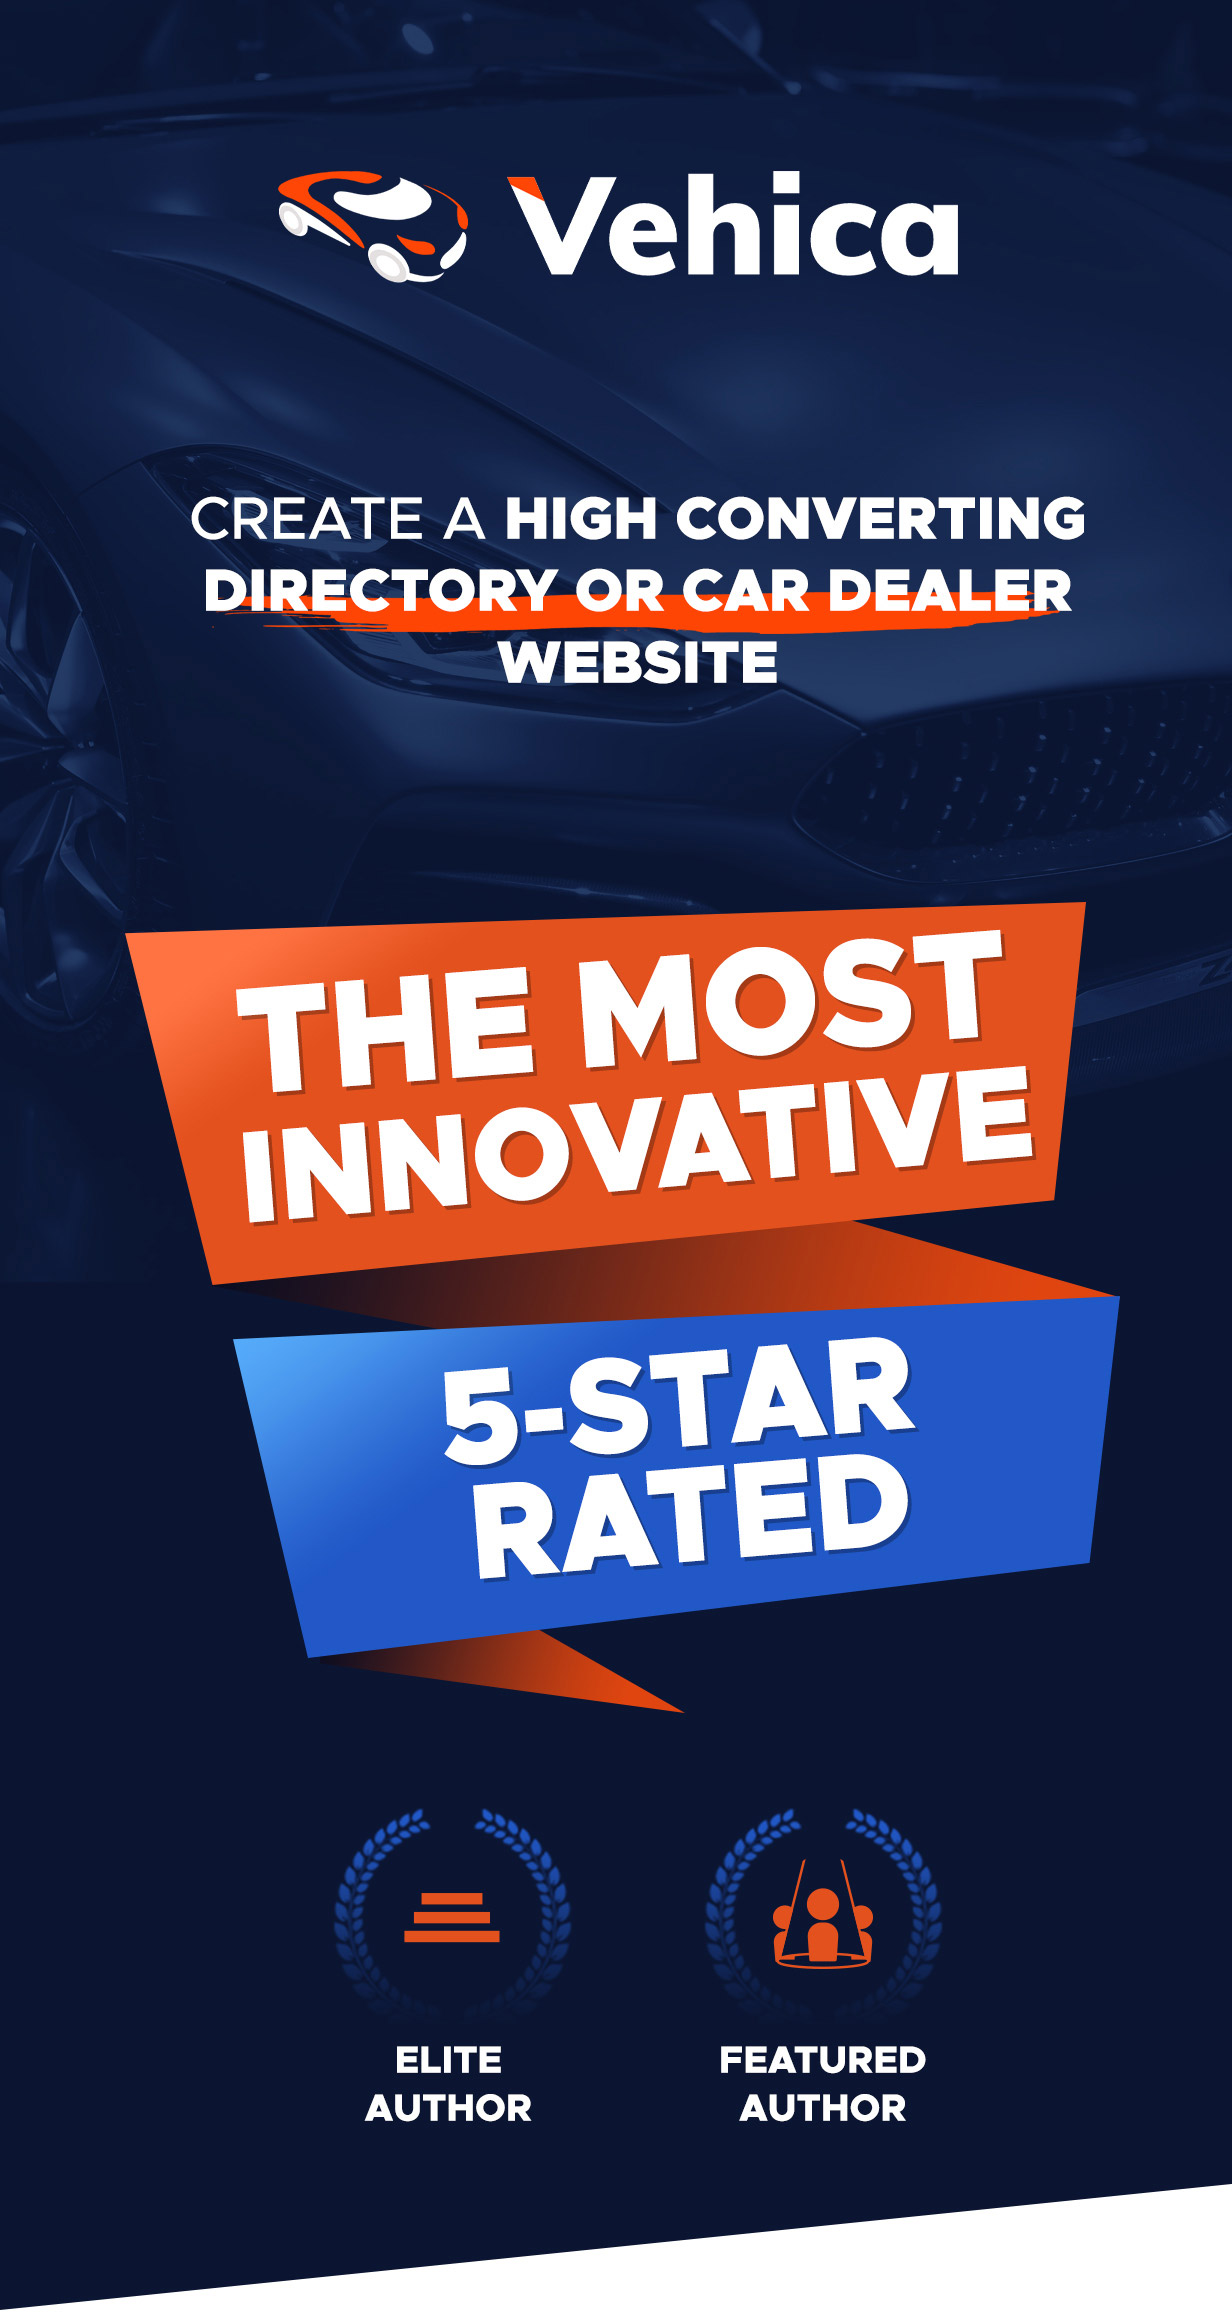 Vehica - Car Dealer & Directory Listing - 1